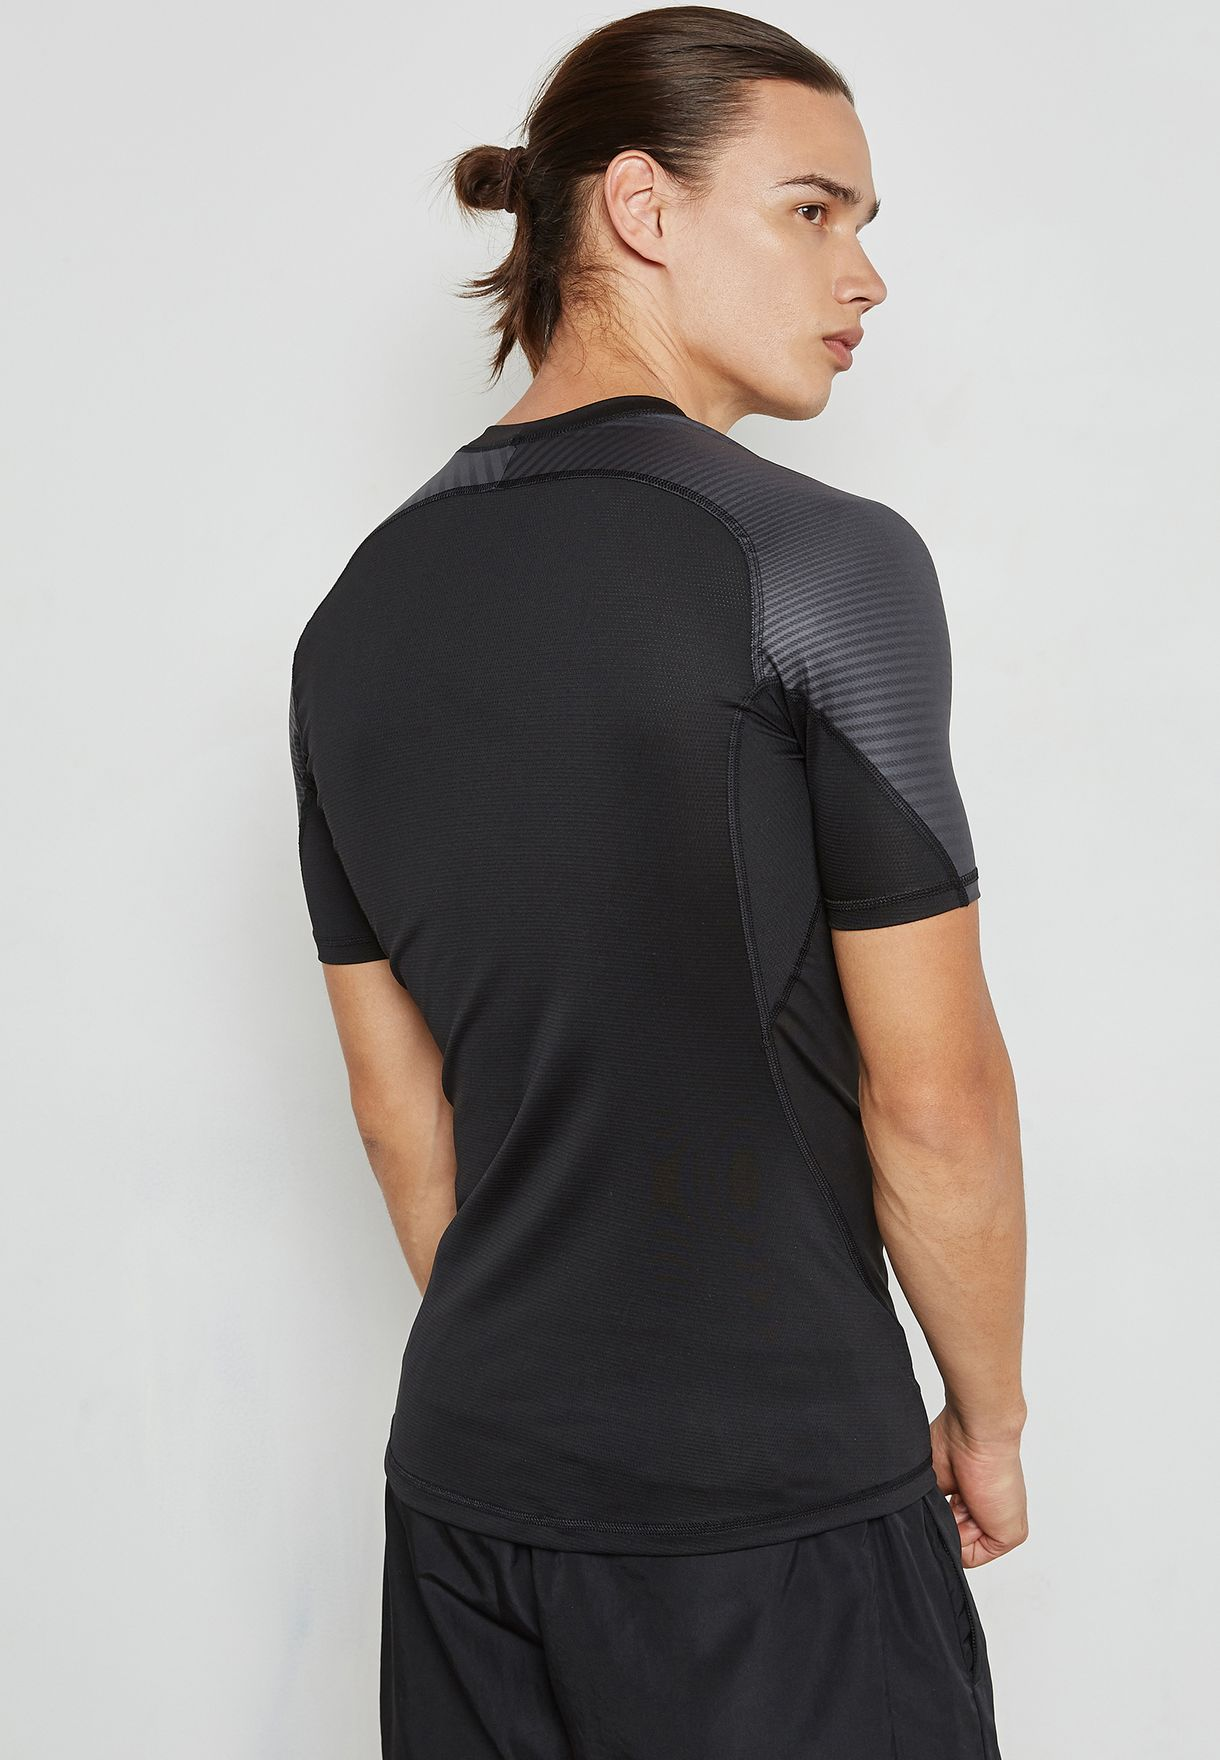 f48e3020e adidas Alphaskin Sport Graphic Tee - SPORTING GOODS Sports Shirts ...